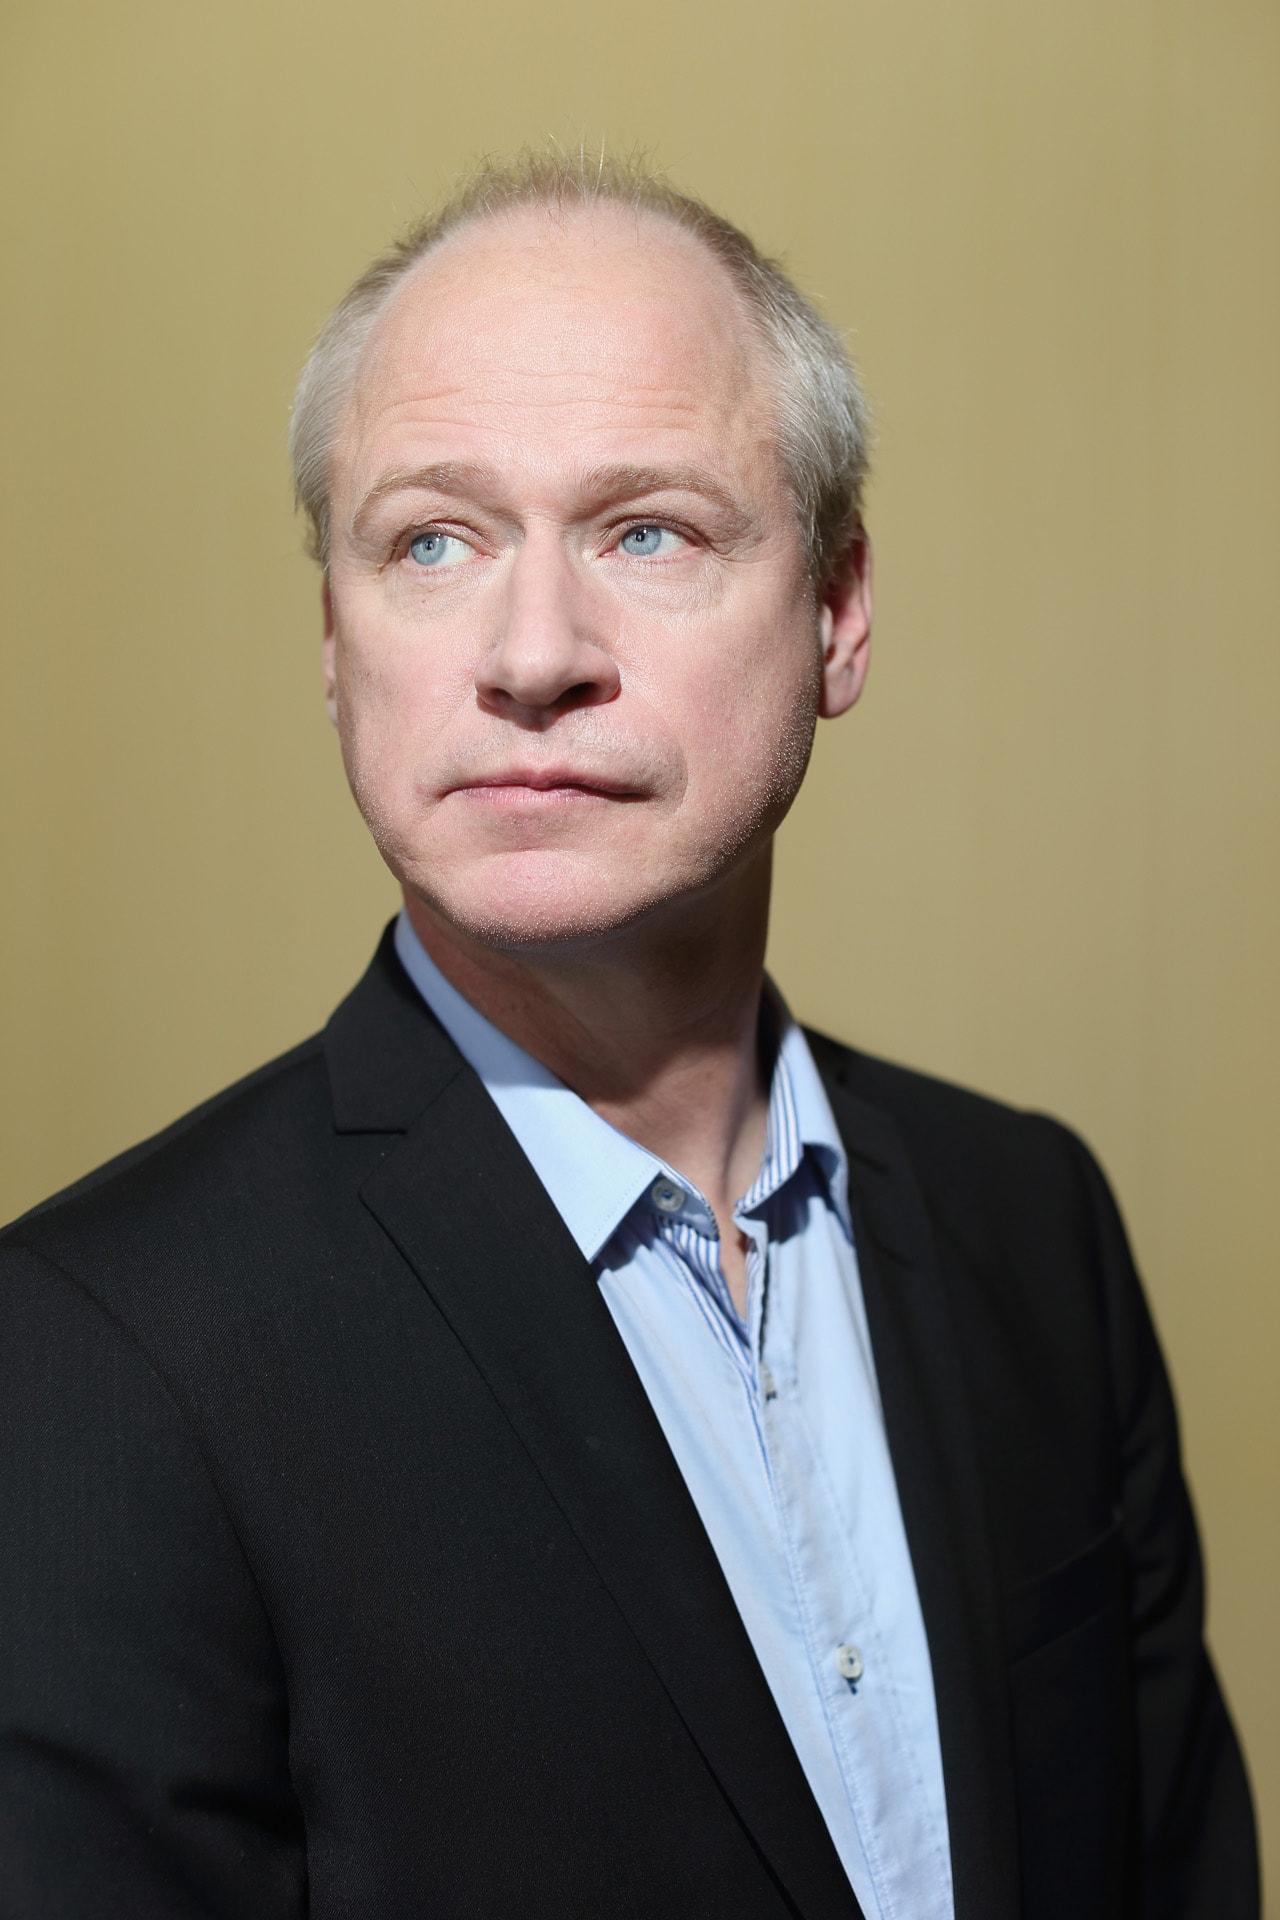 Robert Gustafsson For mobile